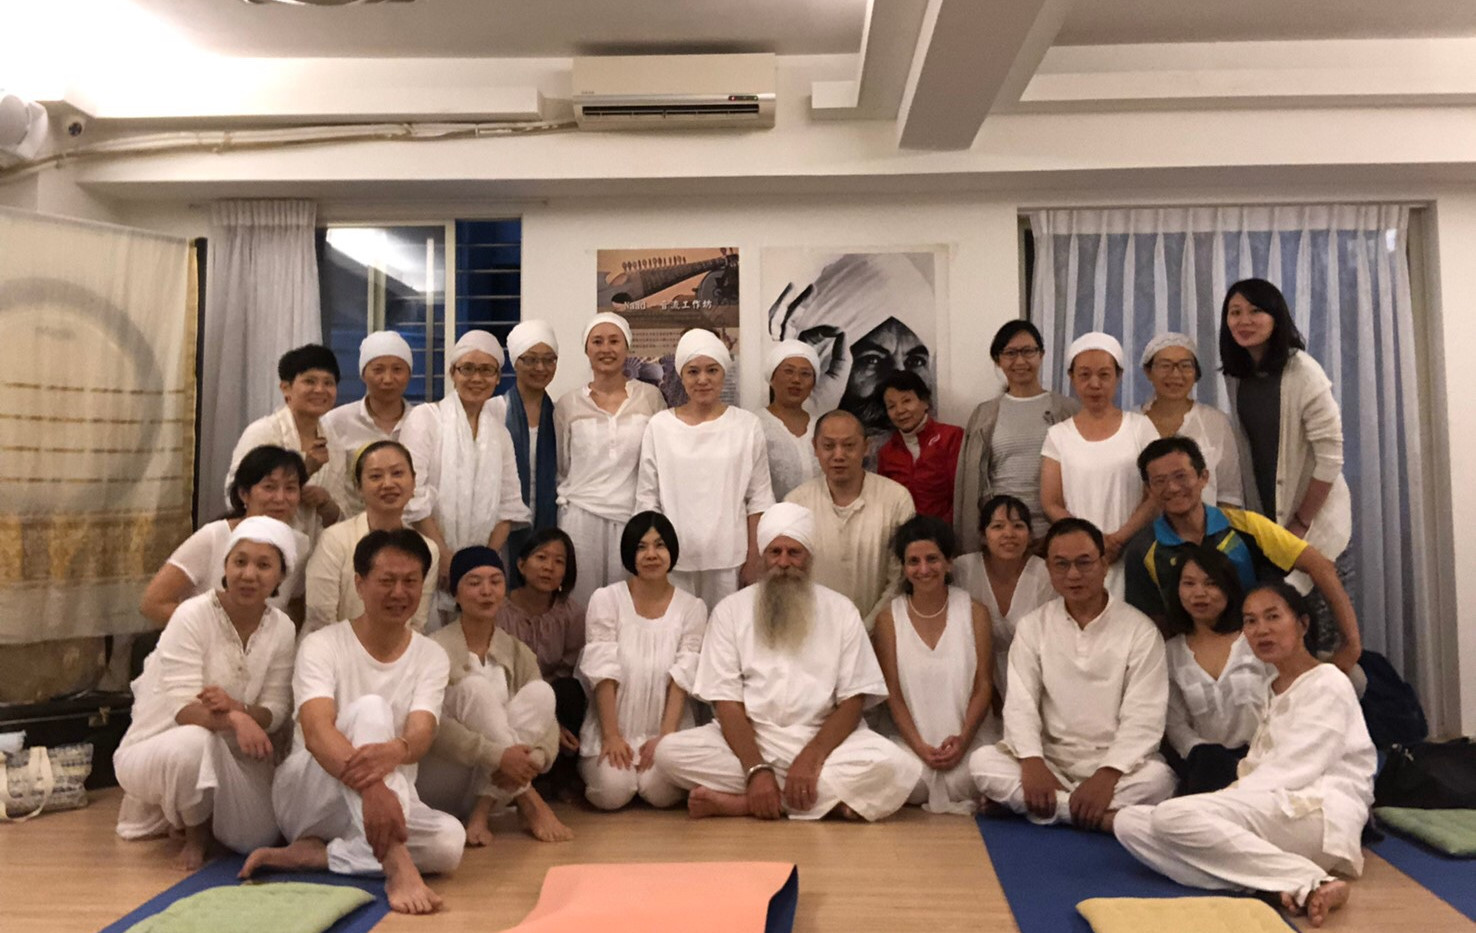 Workshop Naad Group photo 2.JPG